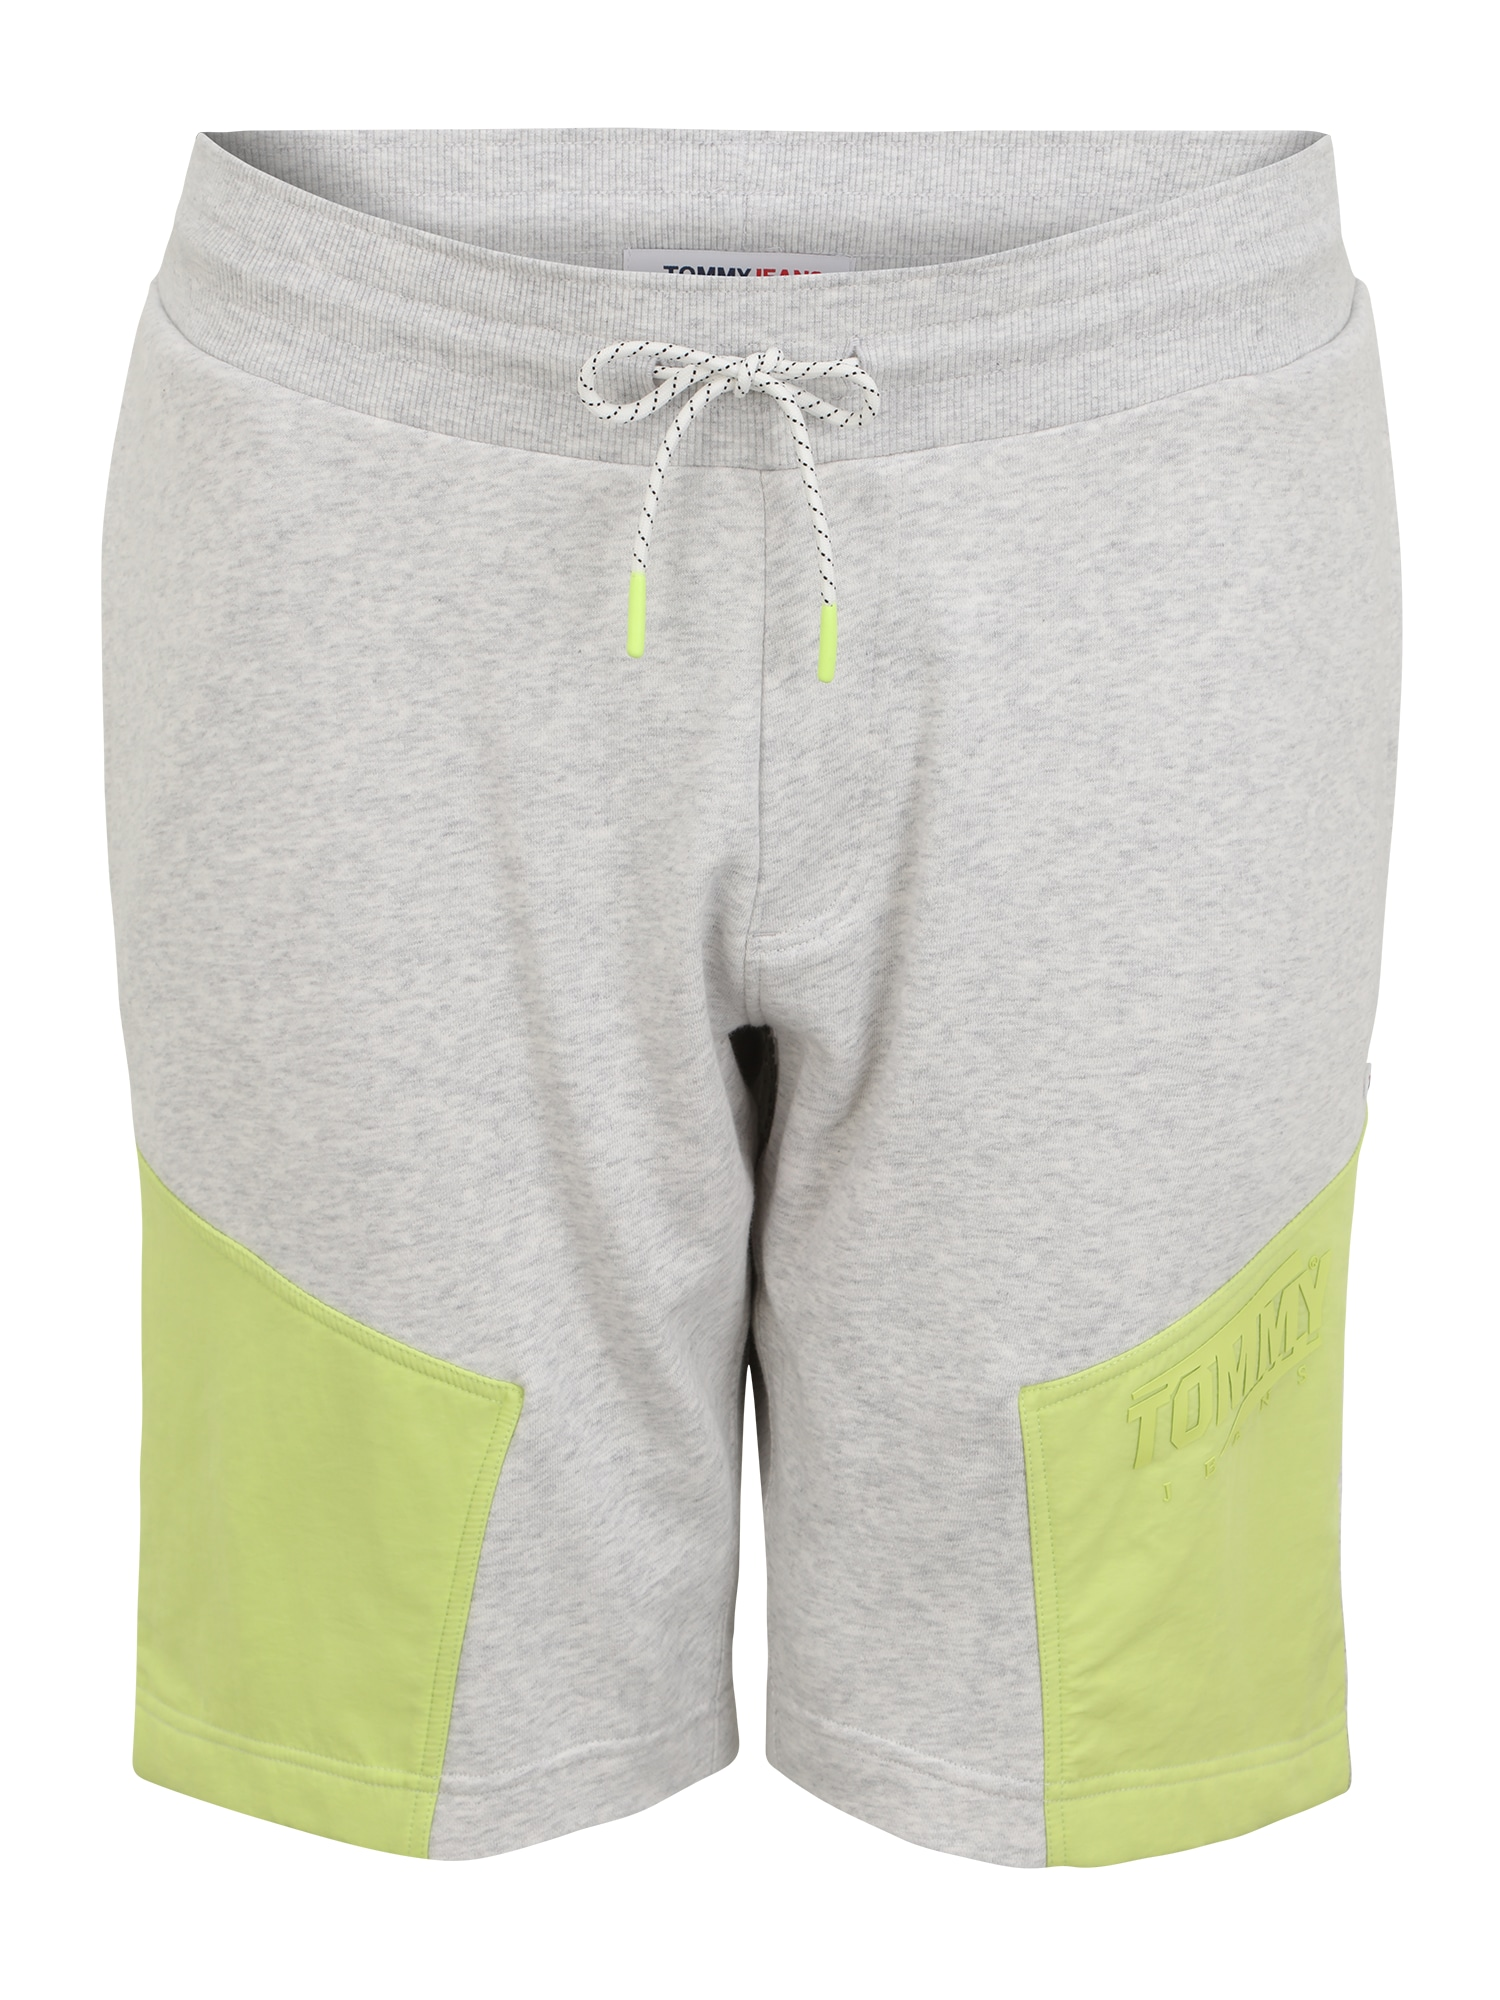 Tommy Jeans Plus Kelnės sidabro pilka / geltona